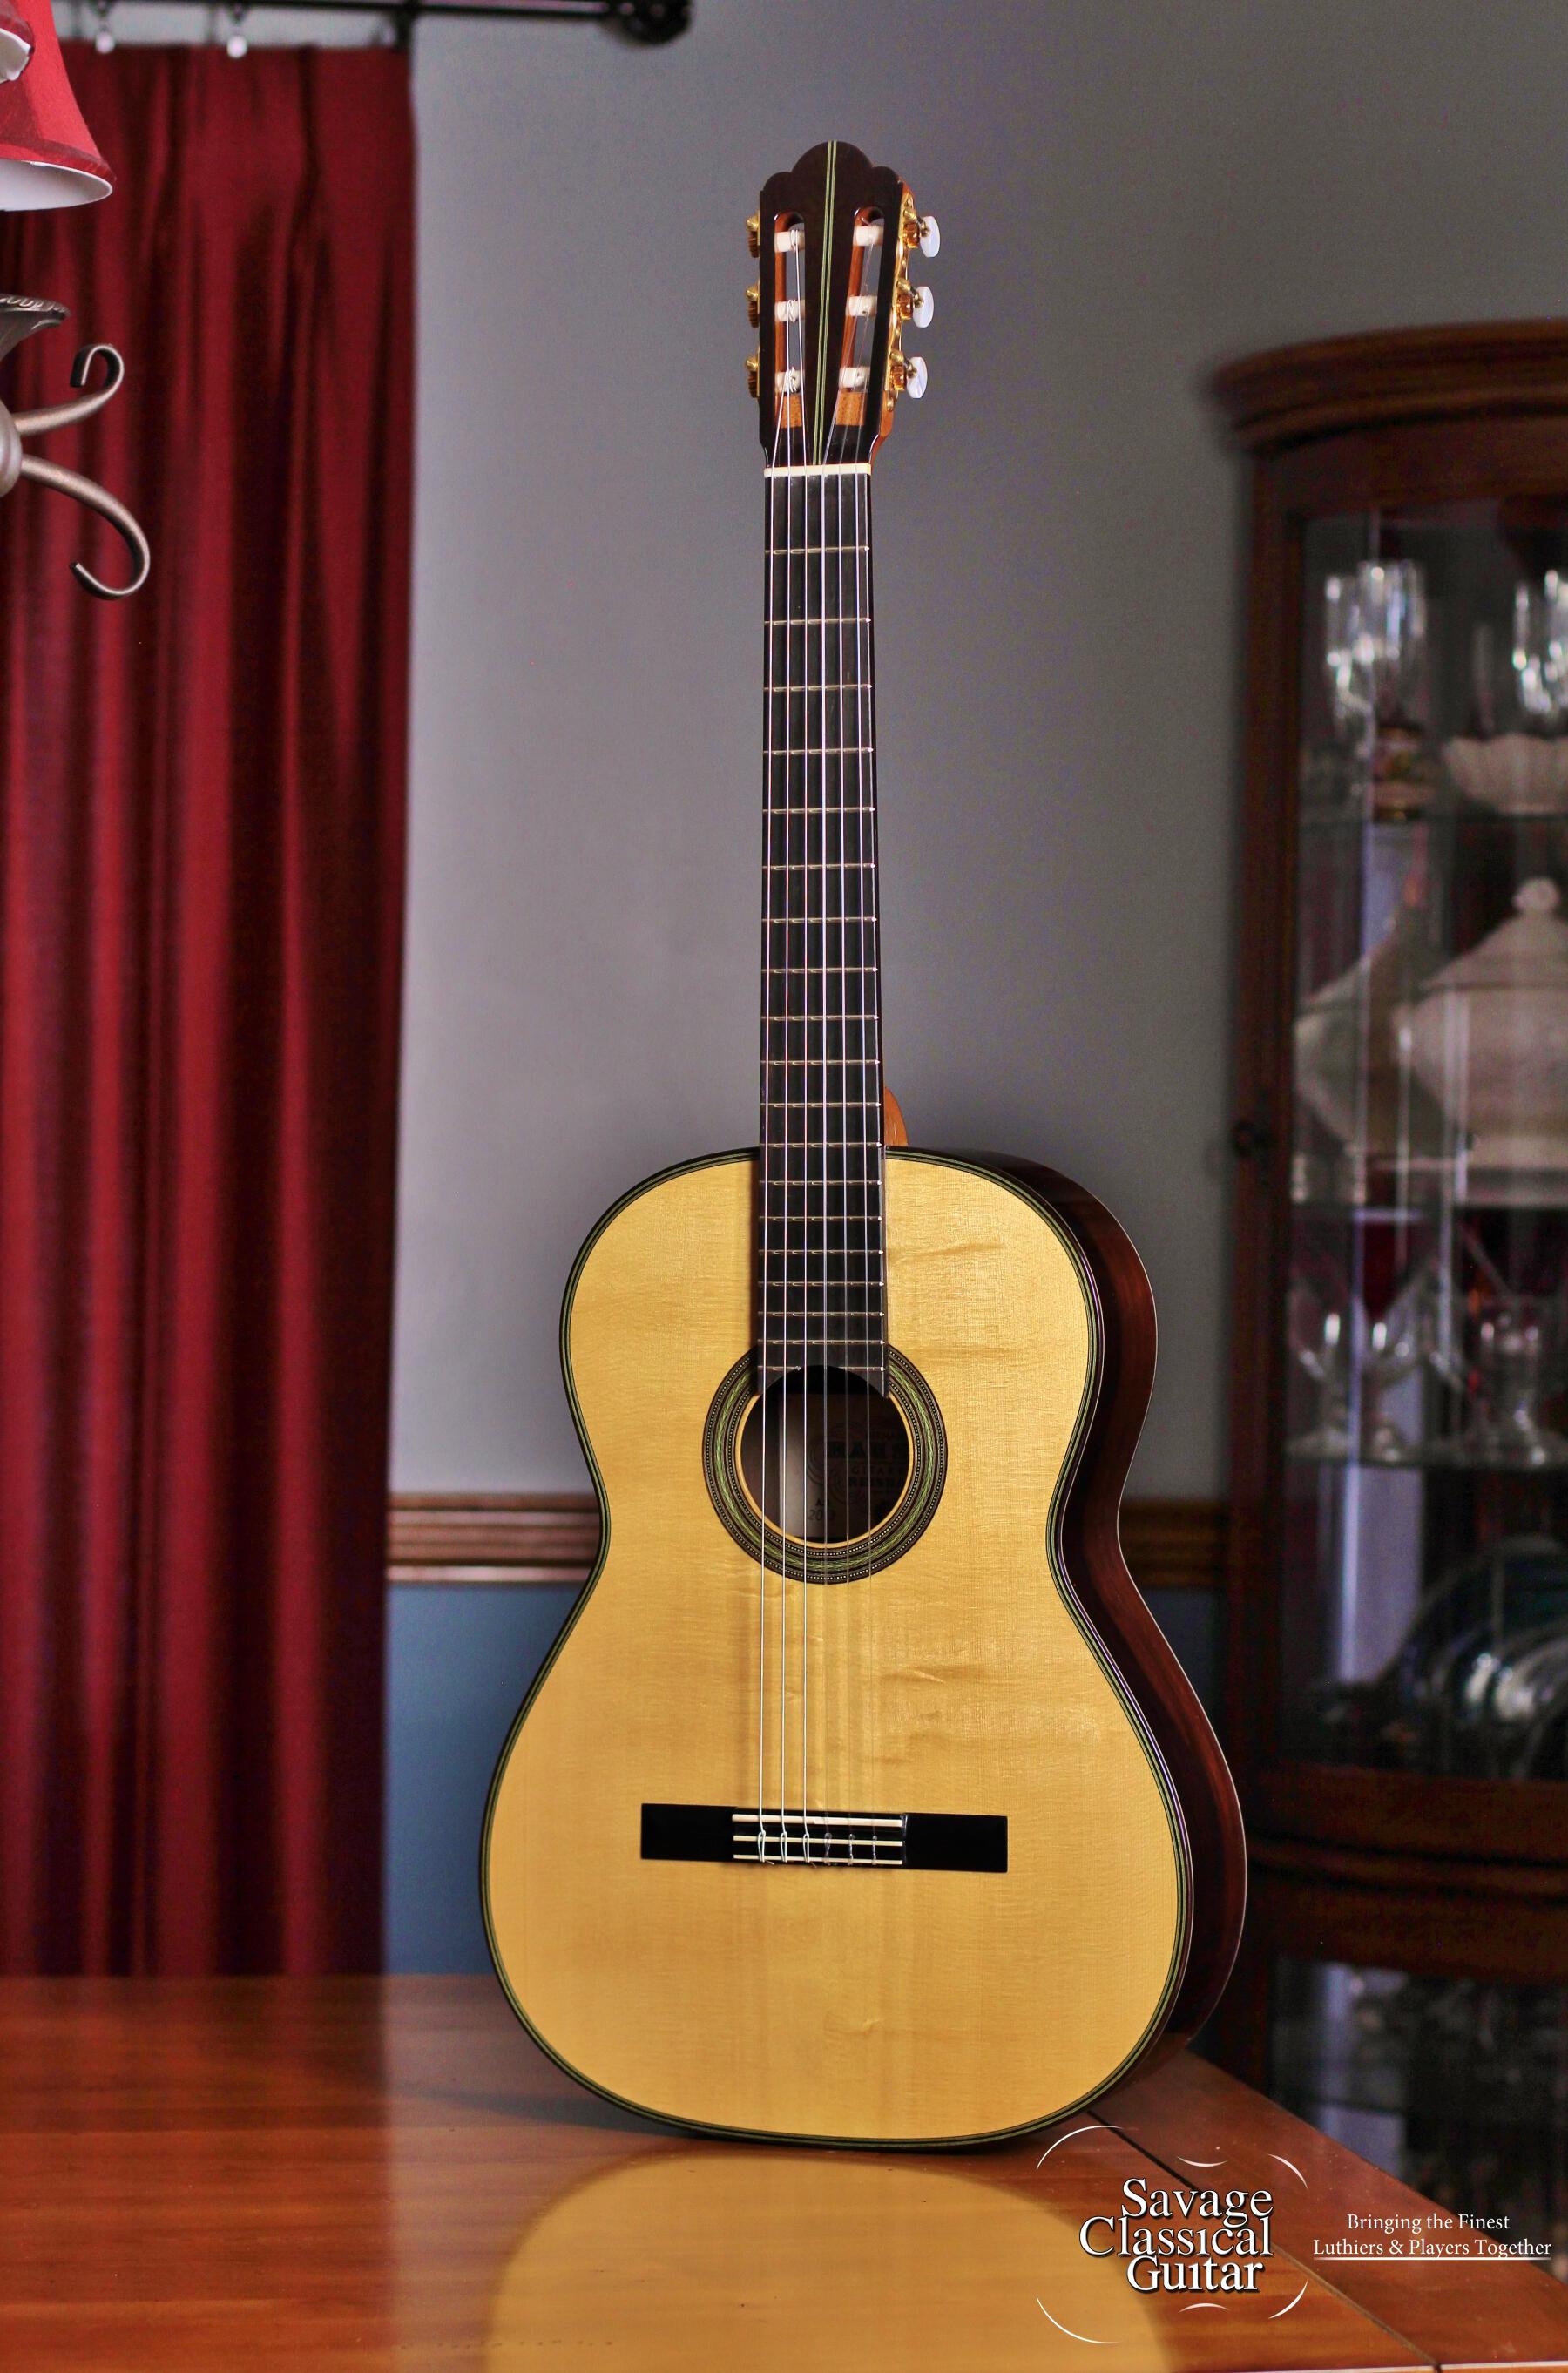 hermann hauser iii by savage classical guitar. Black Bedroom Furniture Sets. Home Design Ideas